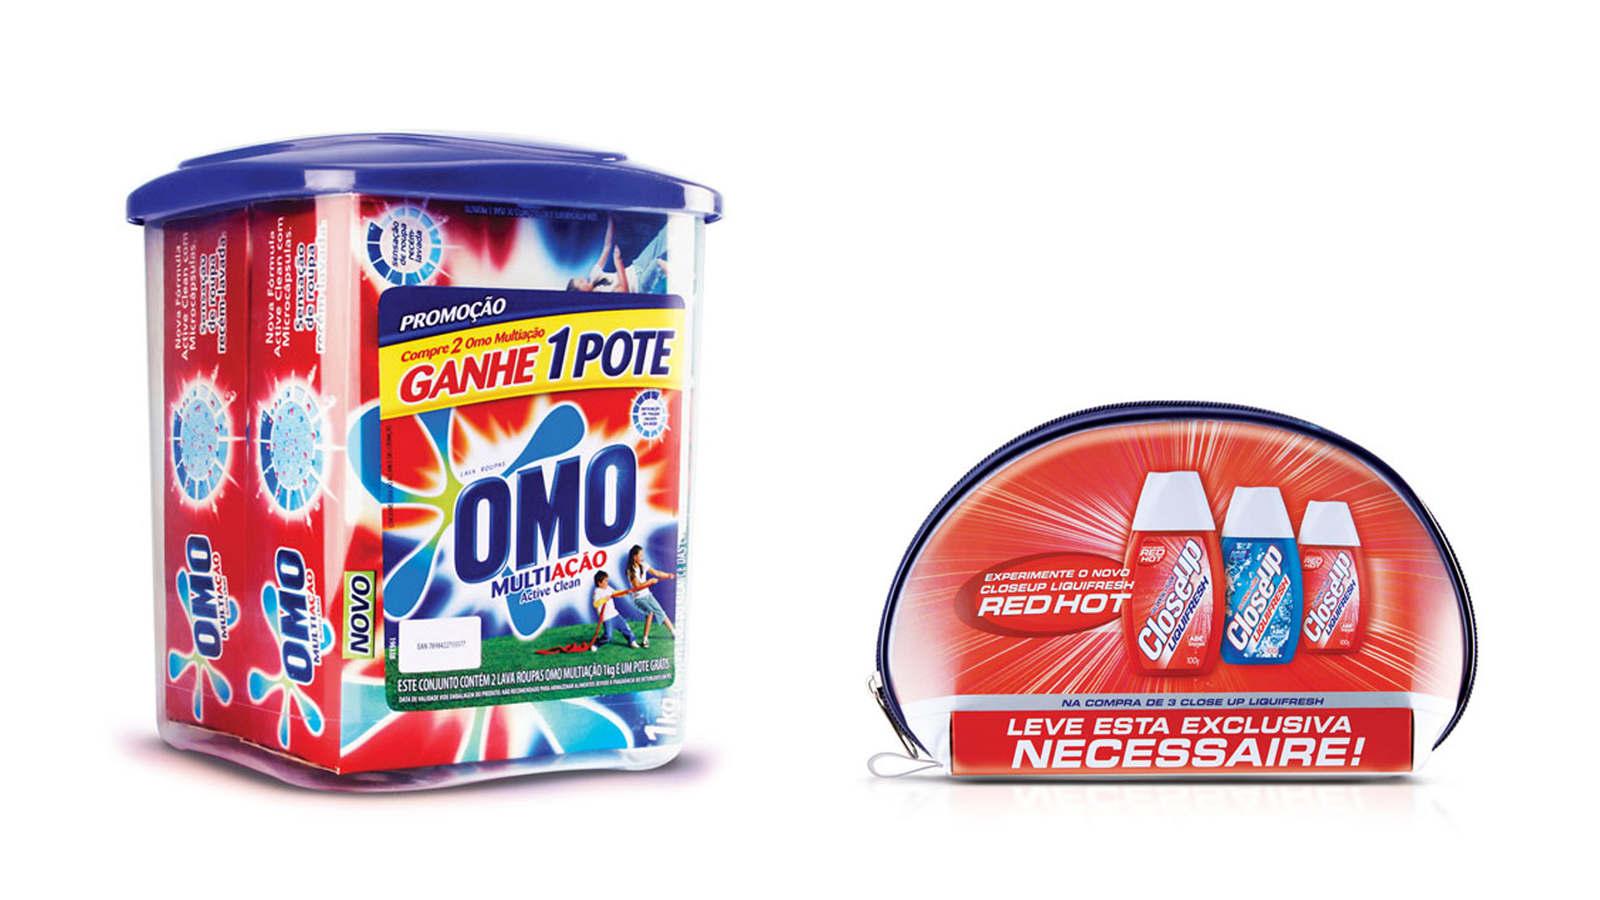 Unilever - Photo Retouch